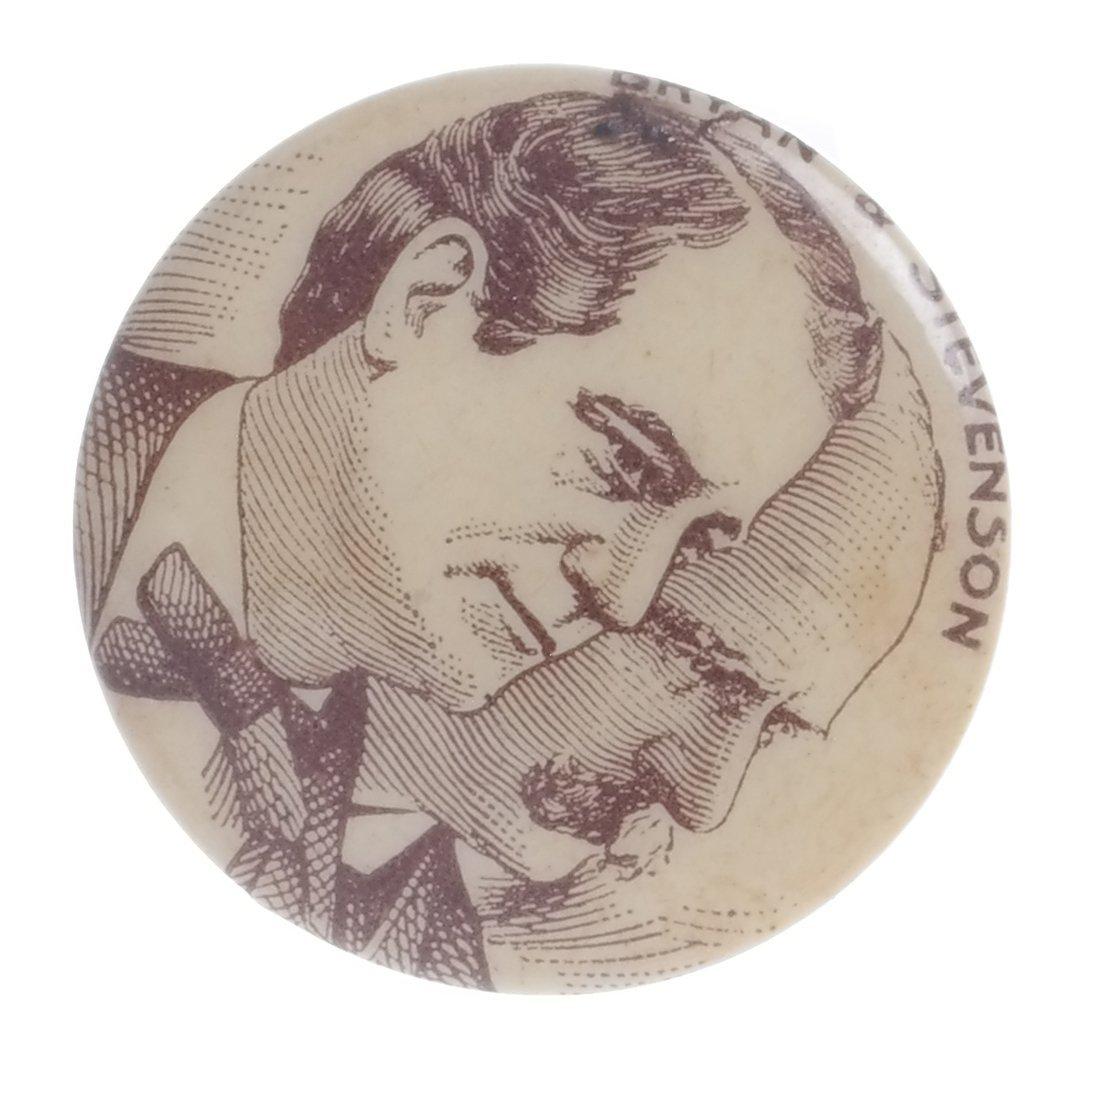 W.J. Bryan & A. Stevenson - 1900 Celluloid Stickpin - 3